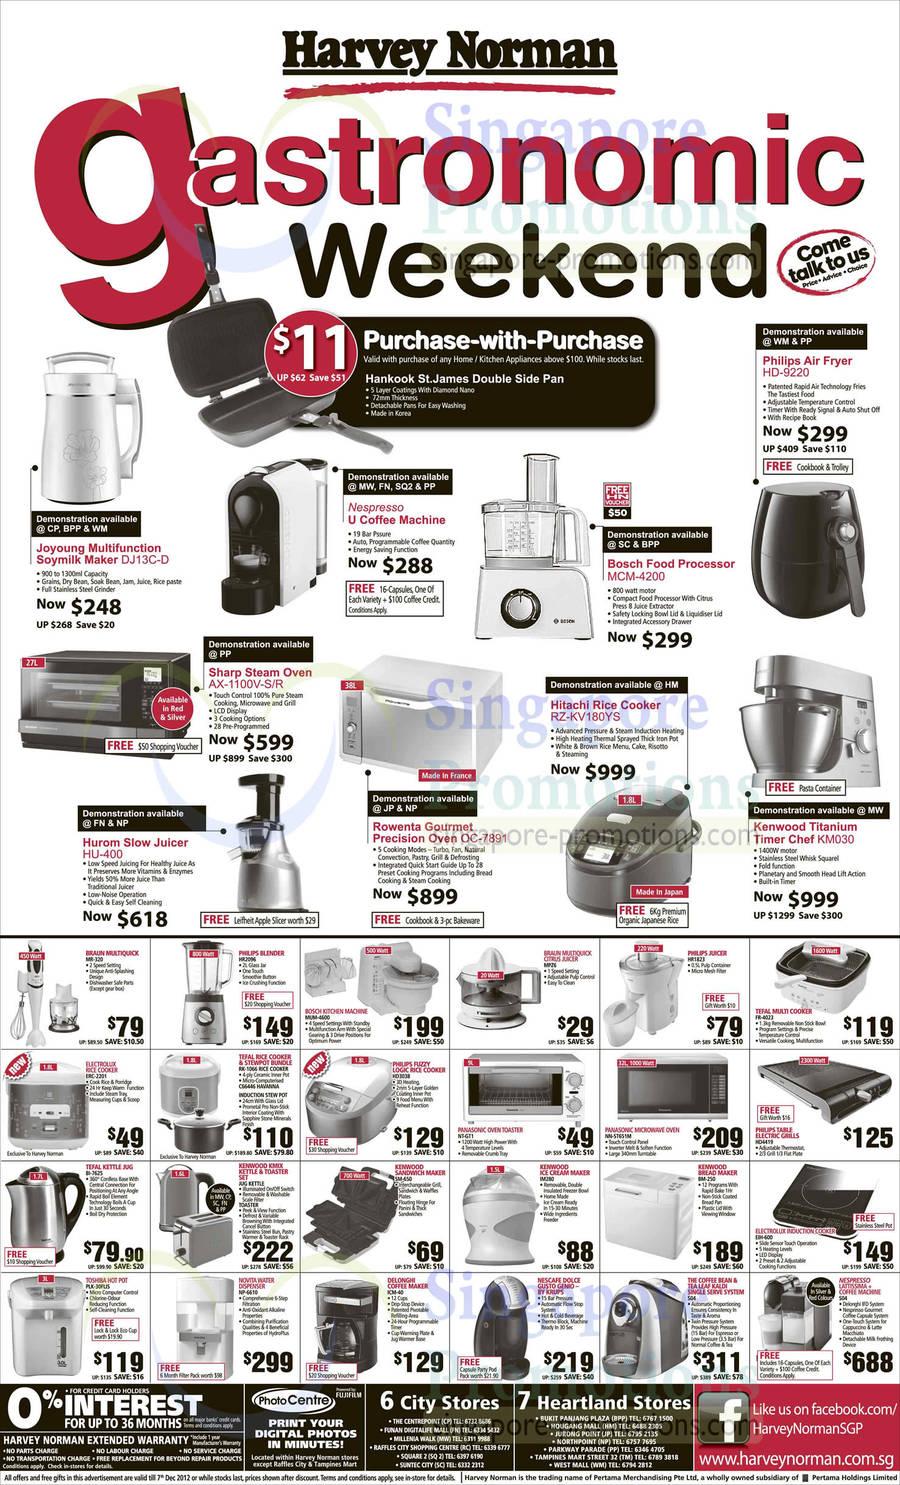 Joyoung DH13C-D Multifunction Soymilk Maker, Nespresso U Coffee Machine, Bosch MCM-4200 Food ...